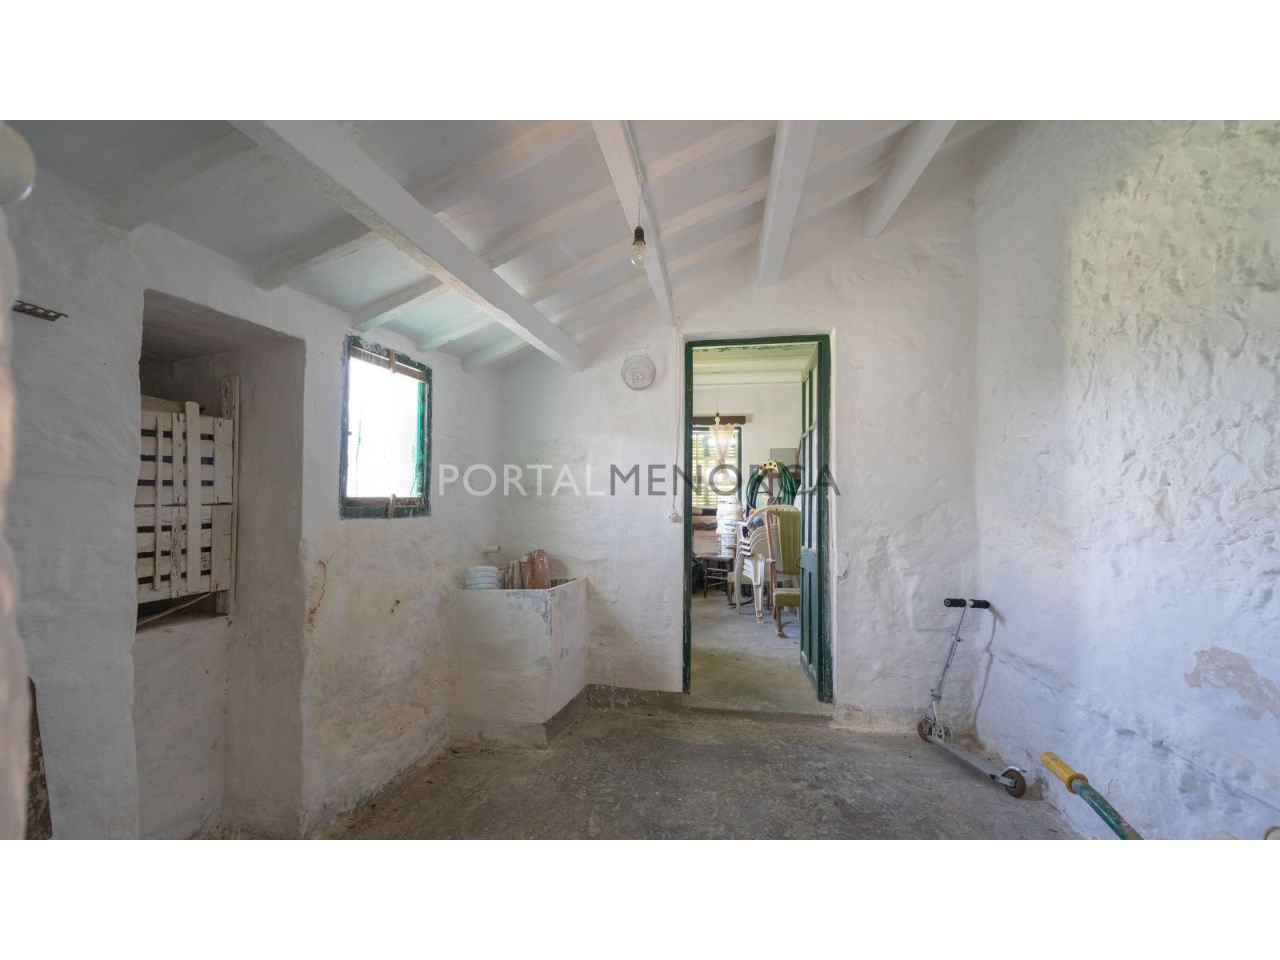 vendre-maison-alaior-menorca (1)